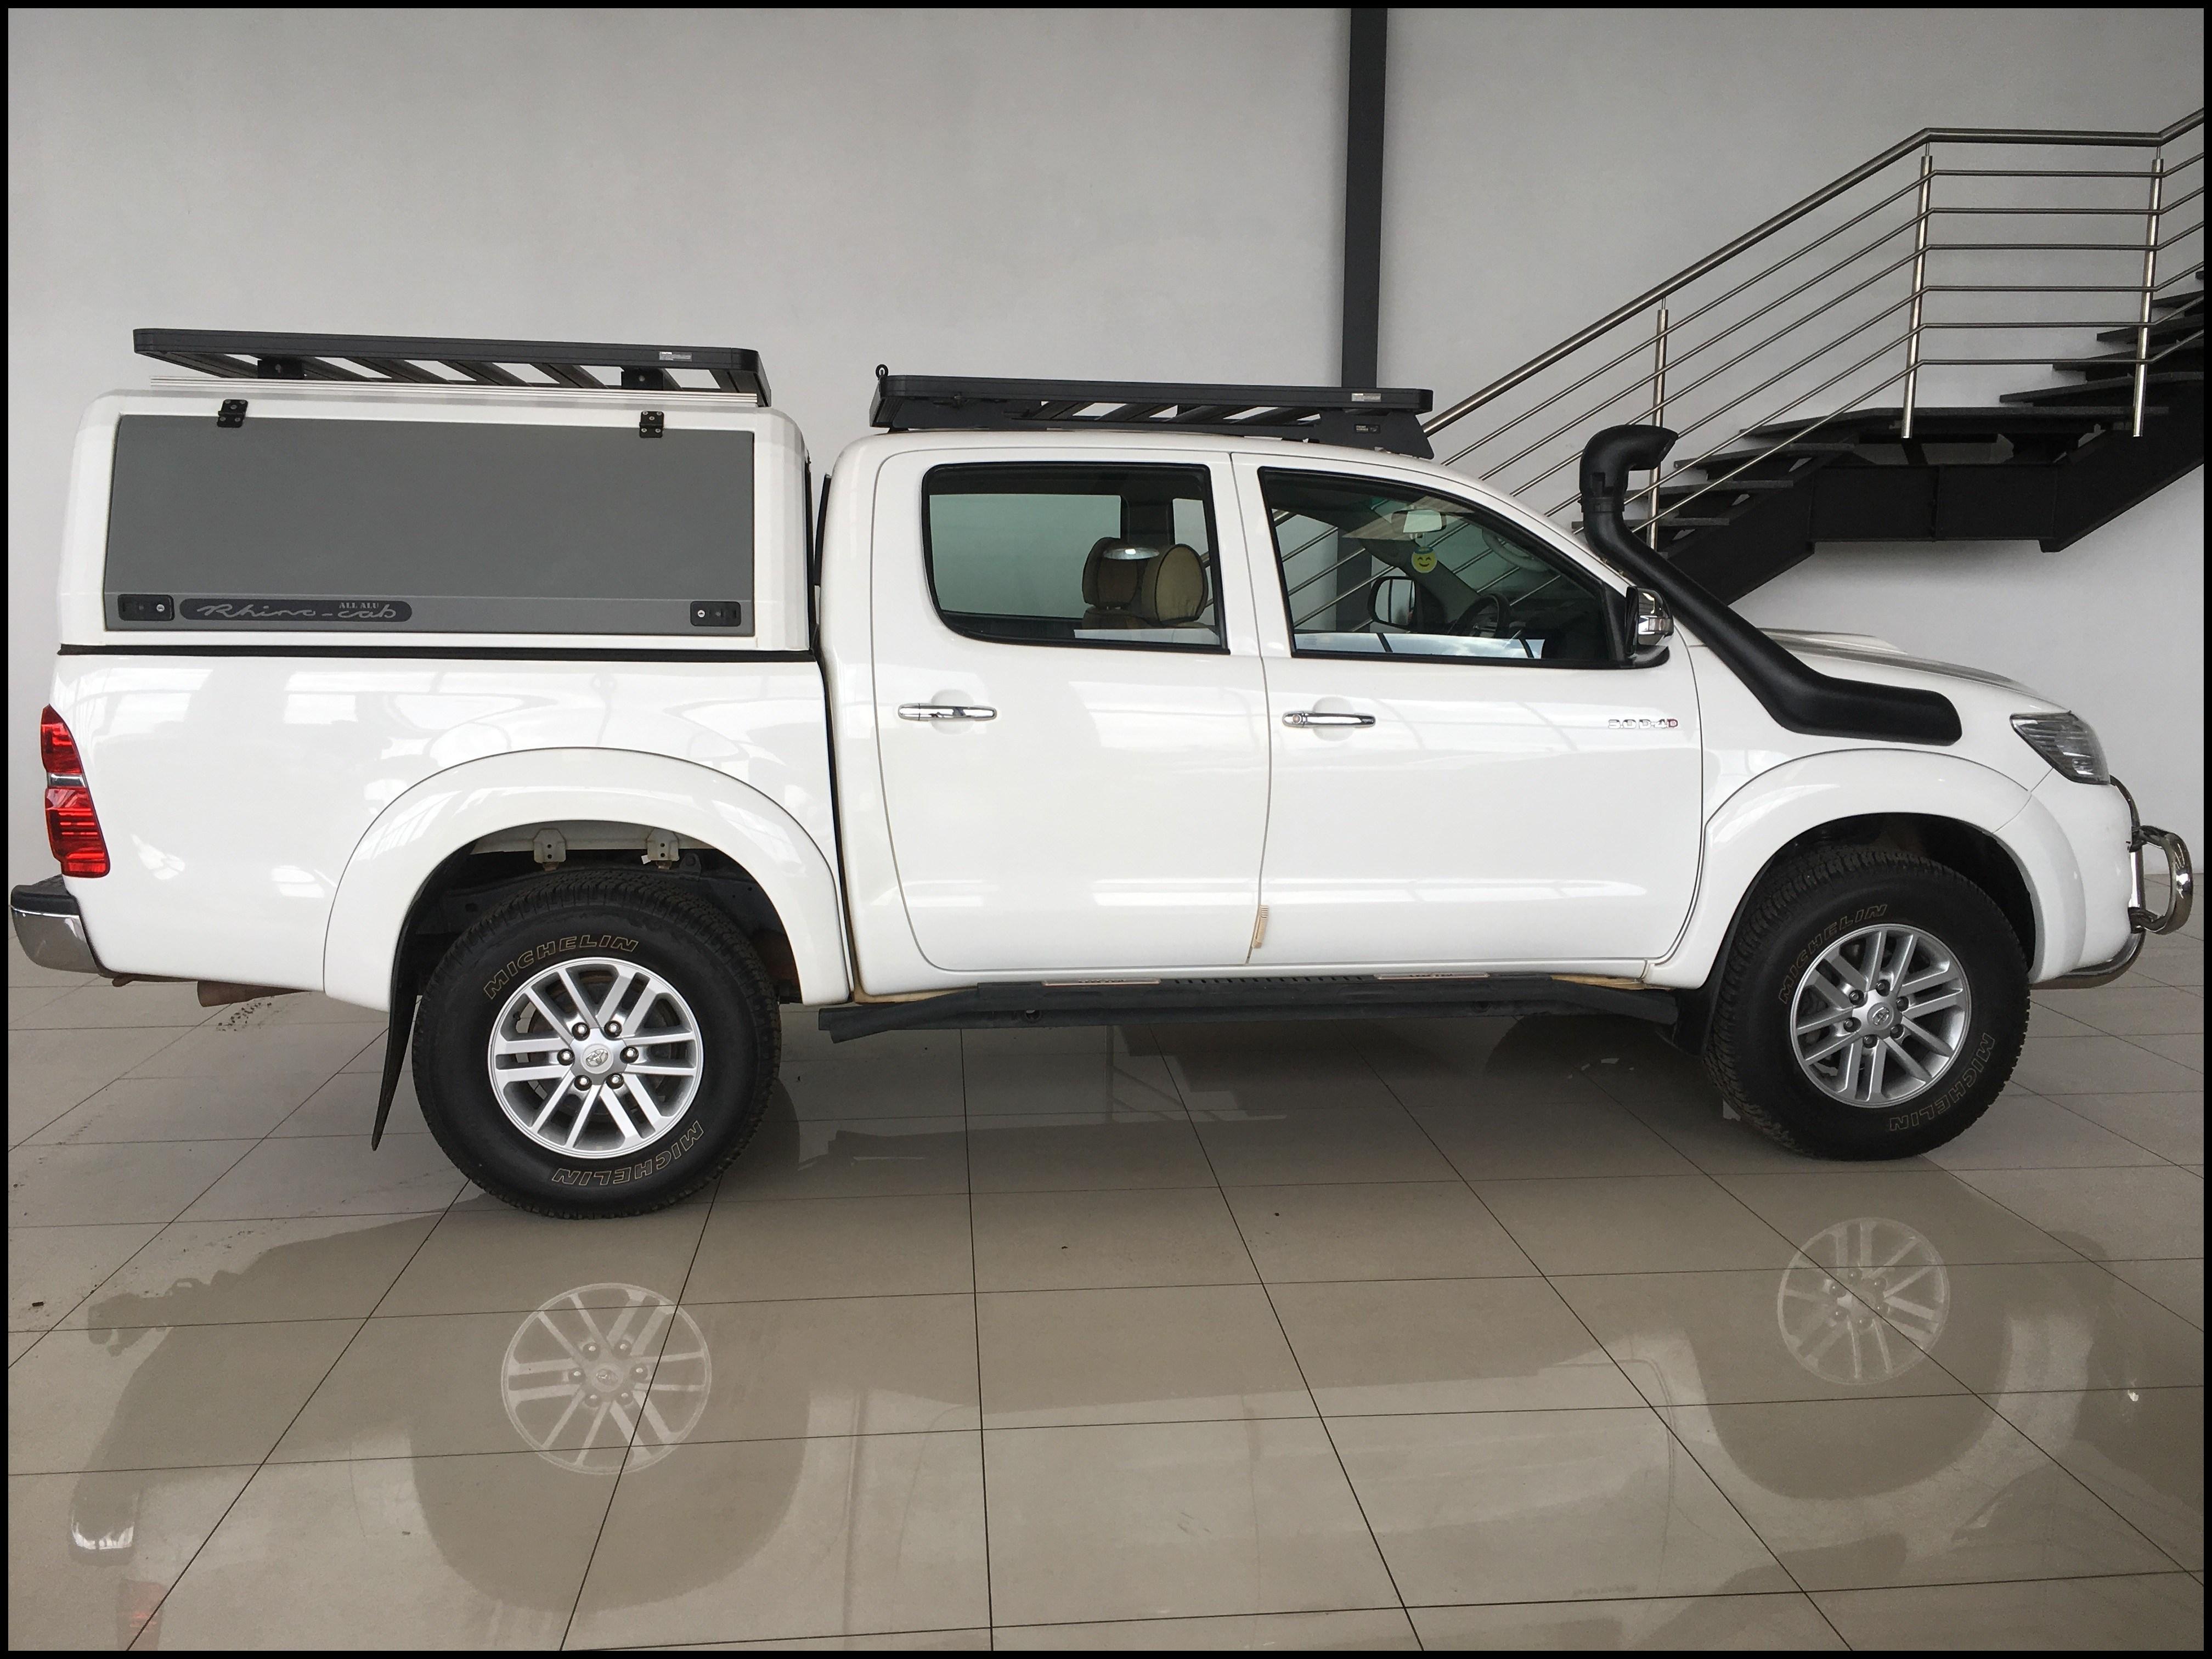 2 Top Types Toyota Trucks Luxury 2014 Hilux 3 0d 4d Raider A T Price